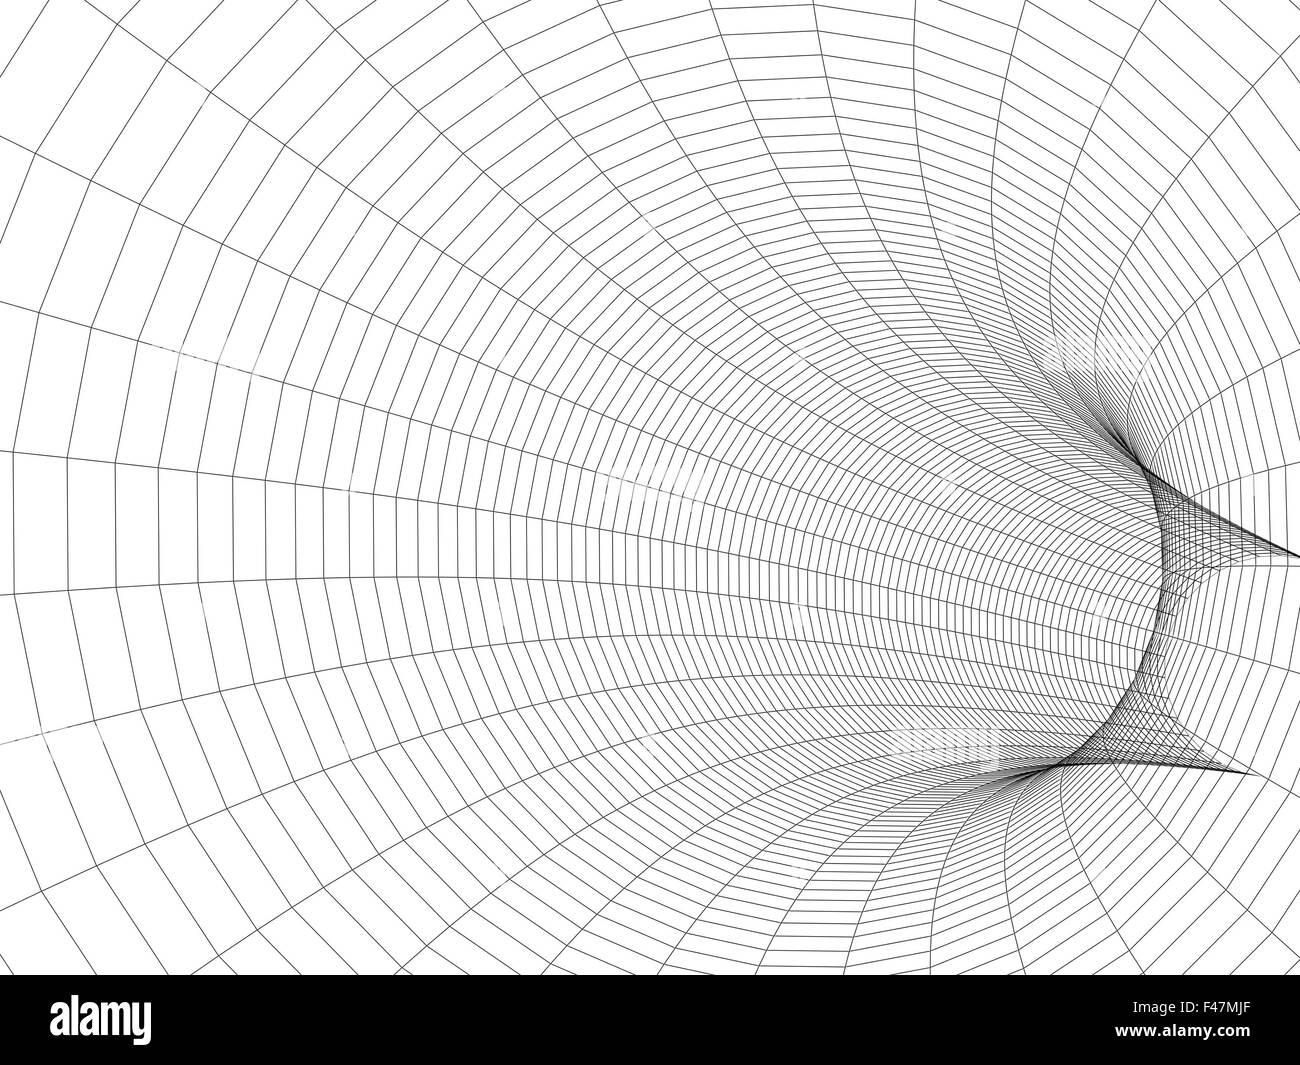 Turning tube tunnel 3d illustration. Black wire-frame digital mesh ...